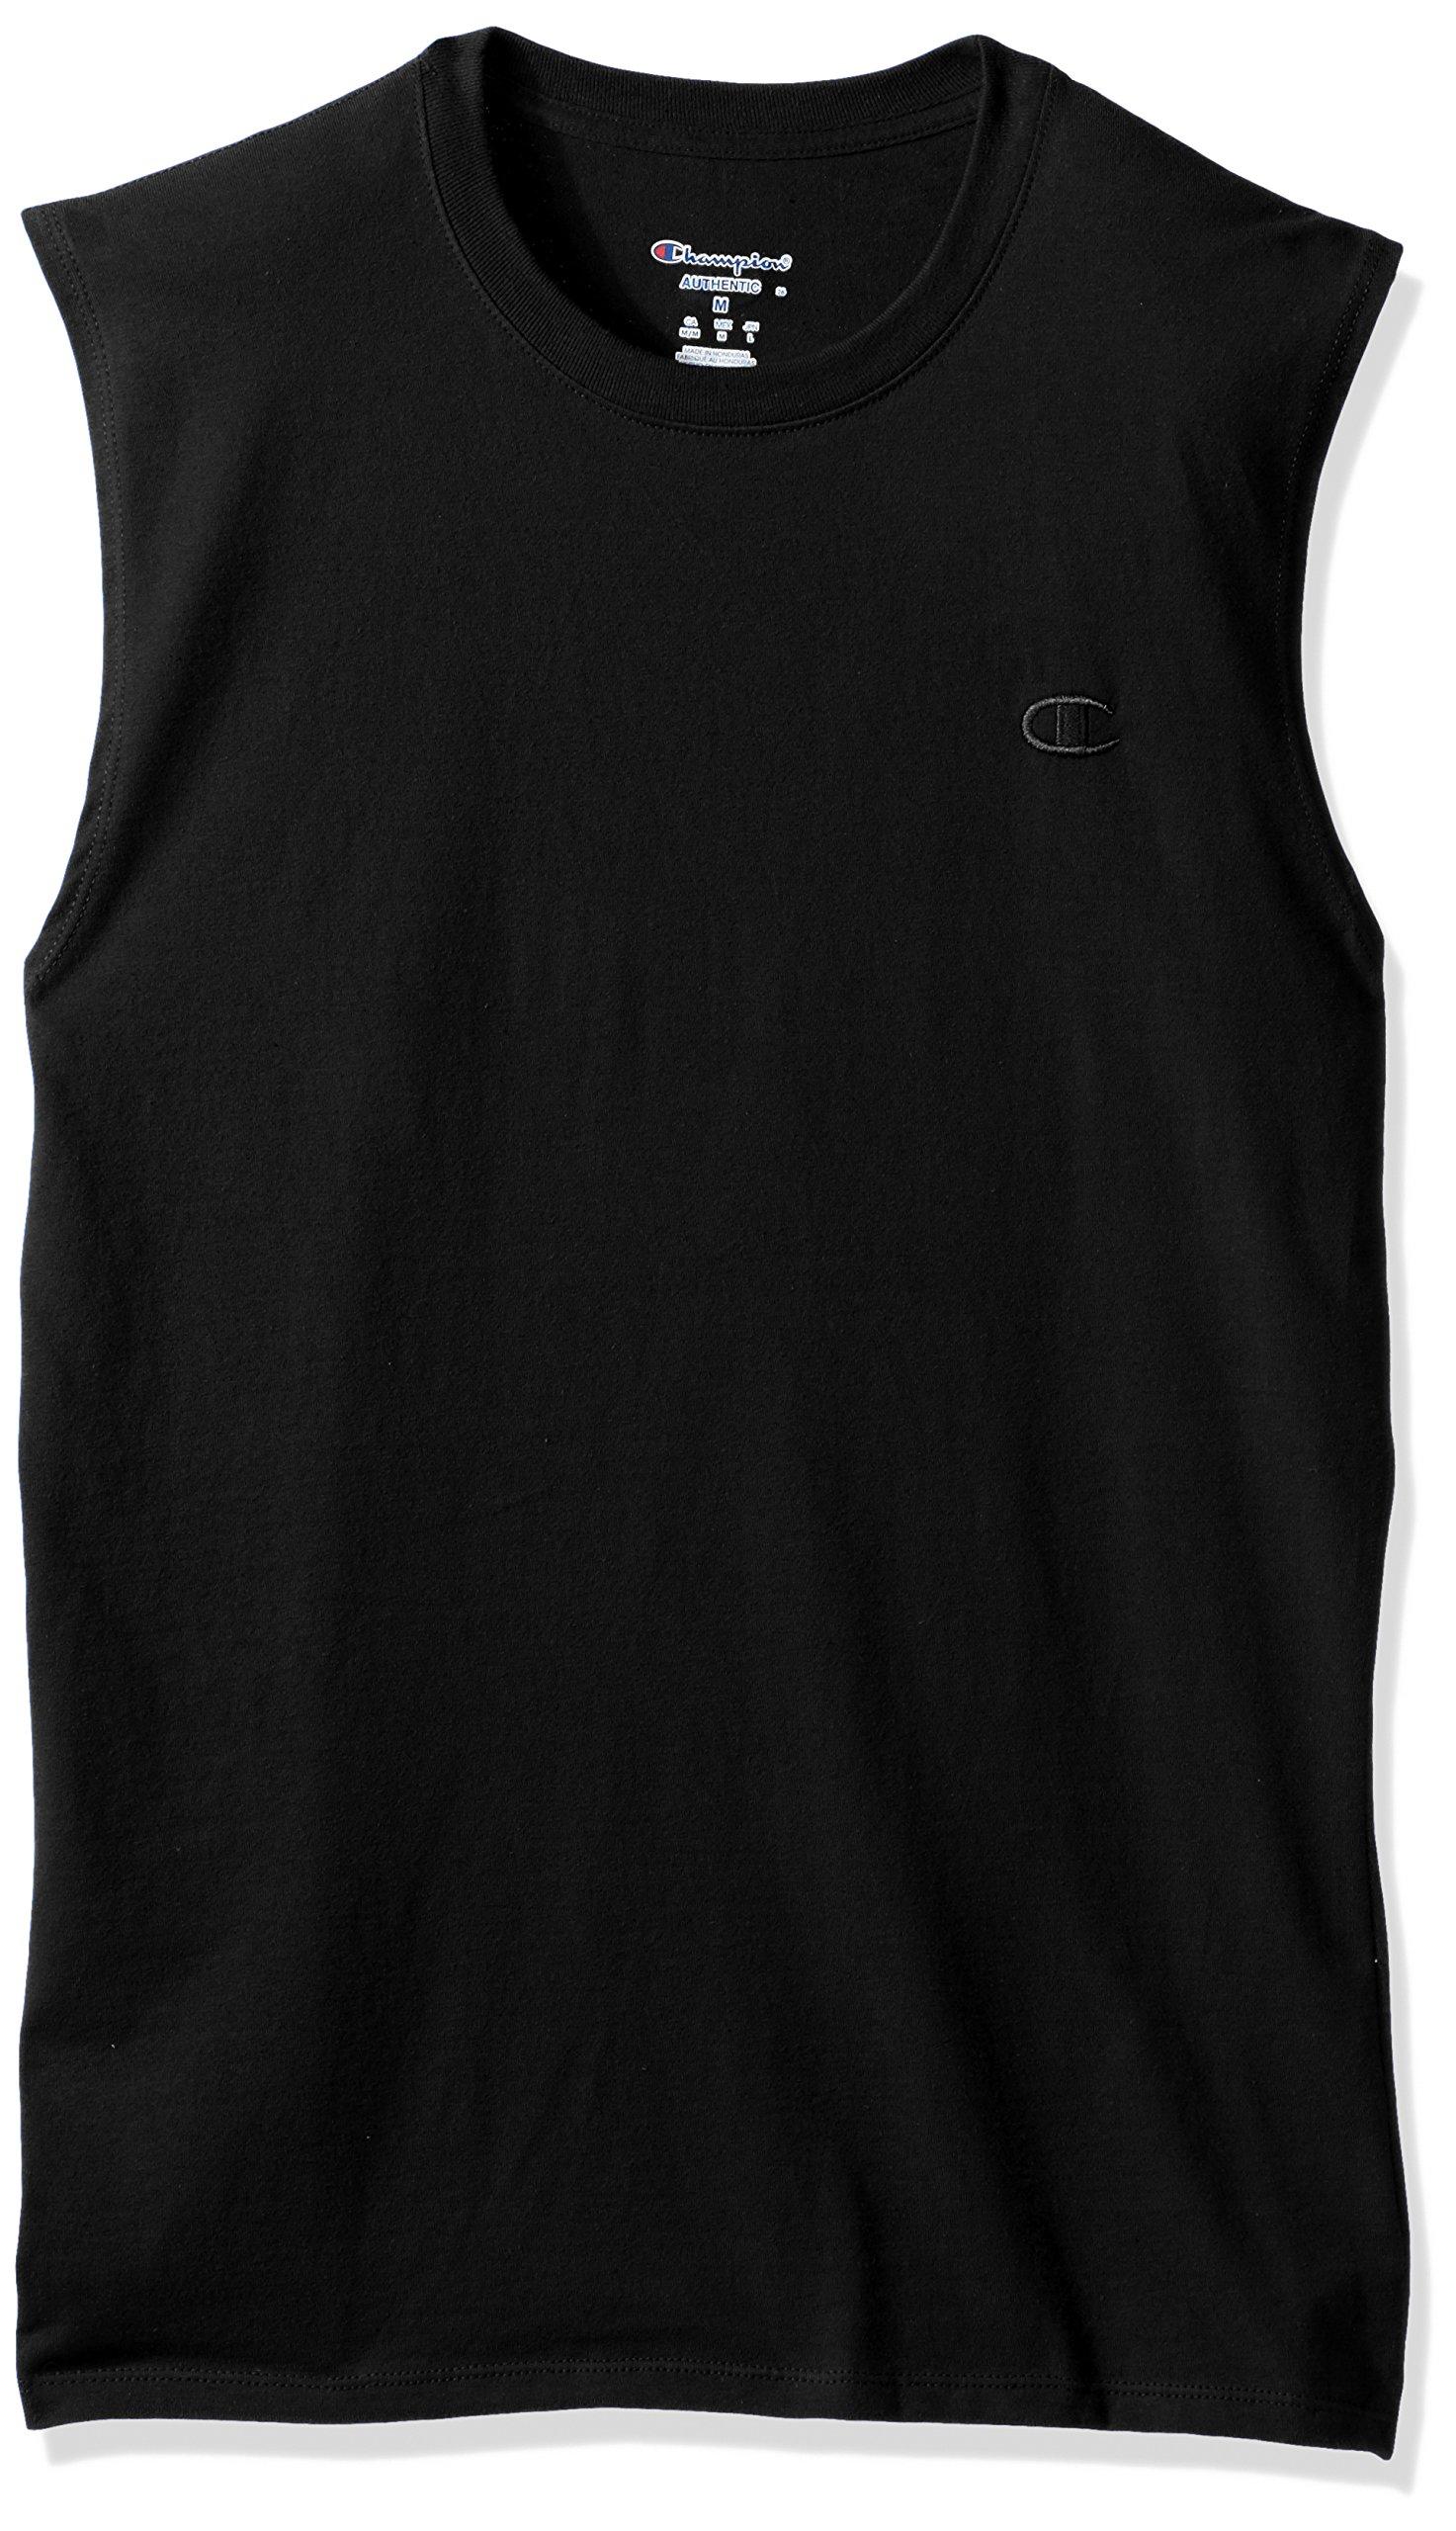 Champion Men's Classic Jersey Muscle T-Shirt, Black, 2XL